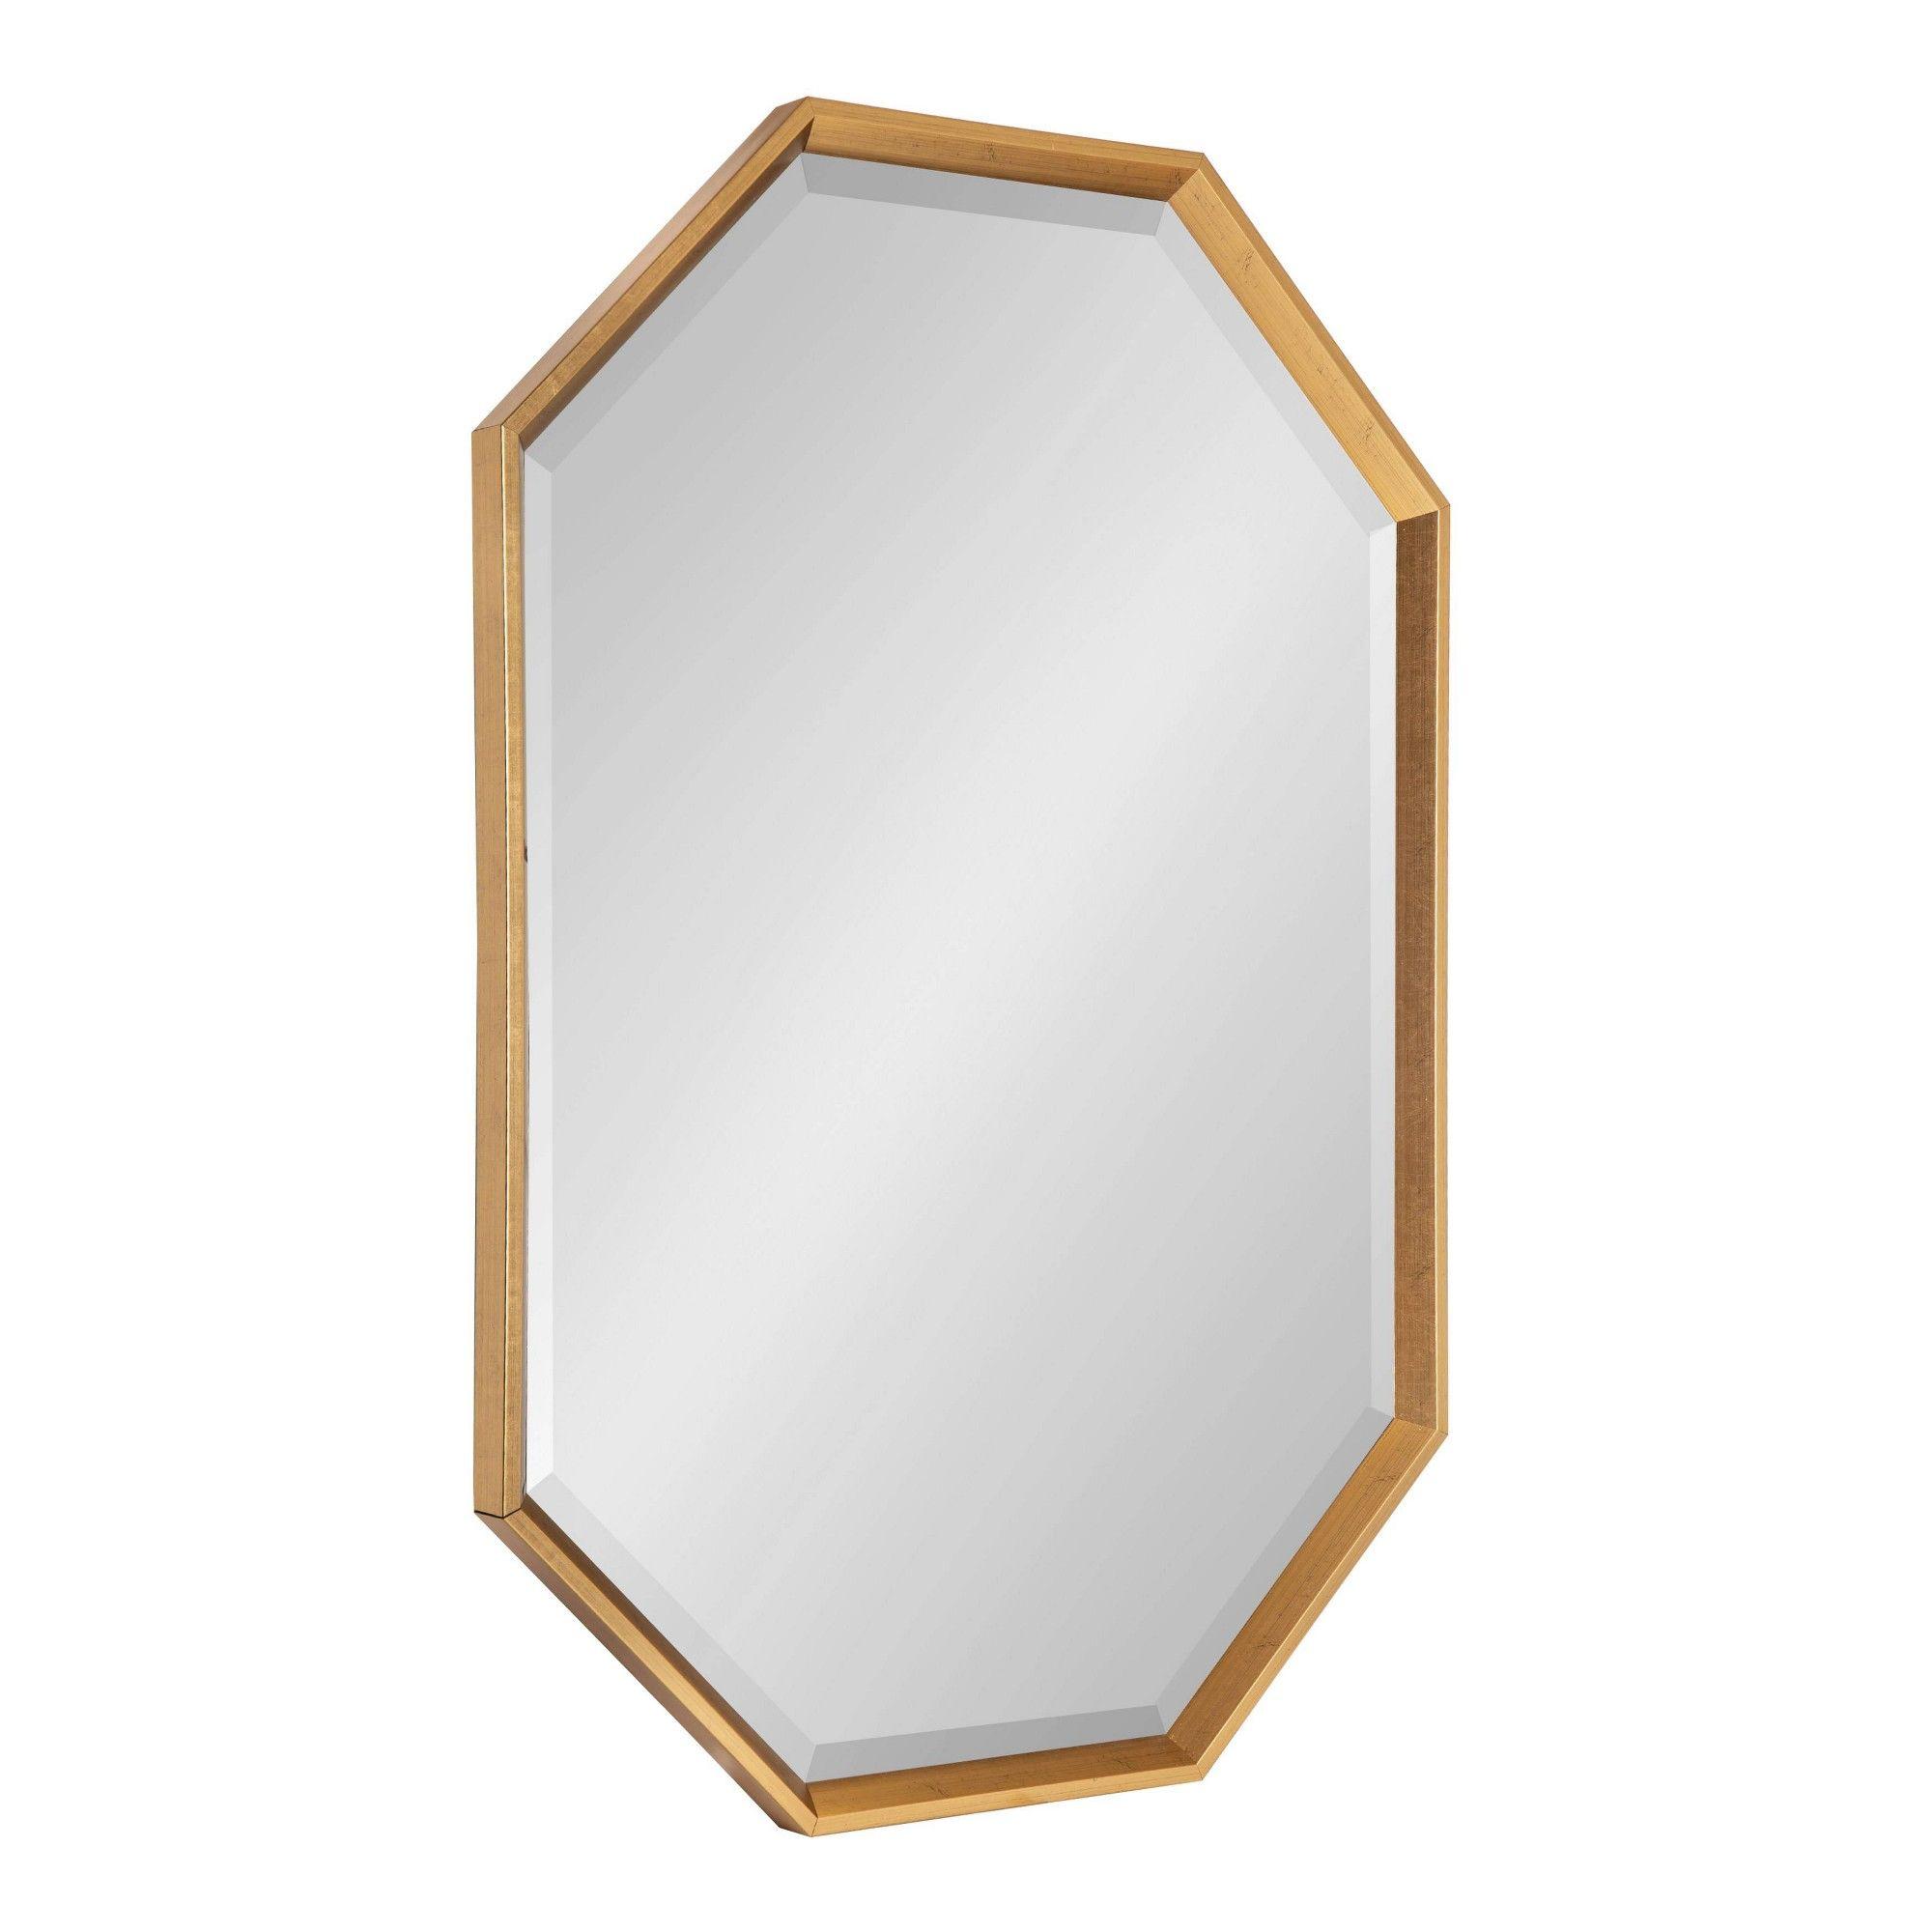 38 X 26 Calter Elongated Octagon Wall Mirror Gold Kate And Laurel Framed Mirror Wall Mirror Wall Octagon Mirror